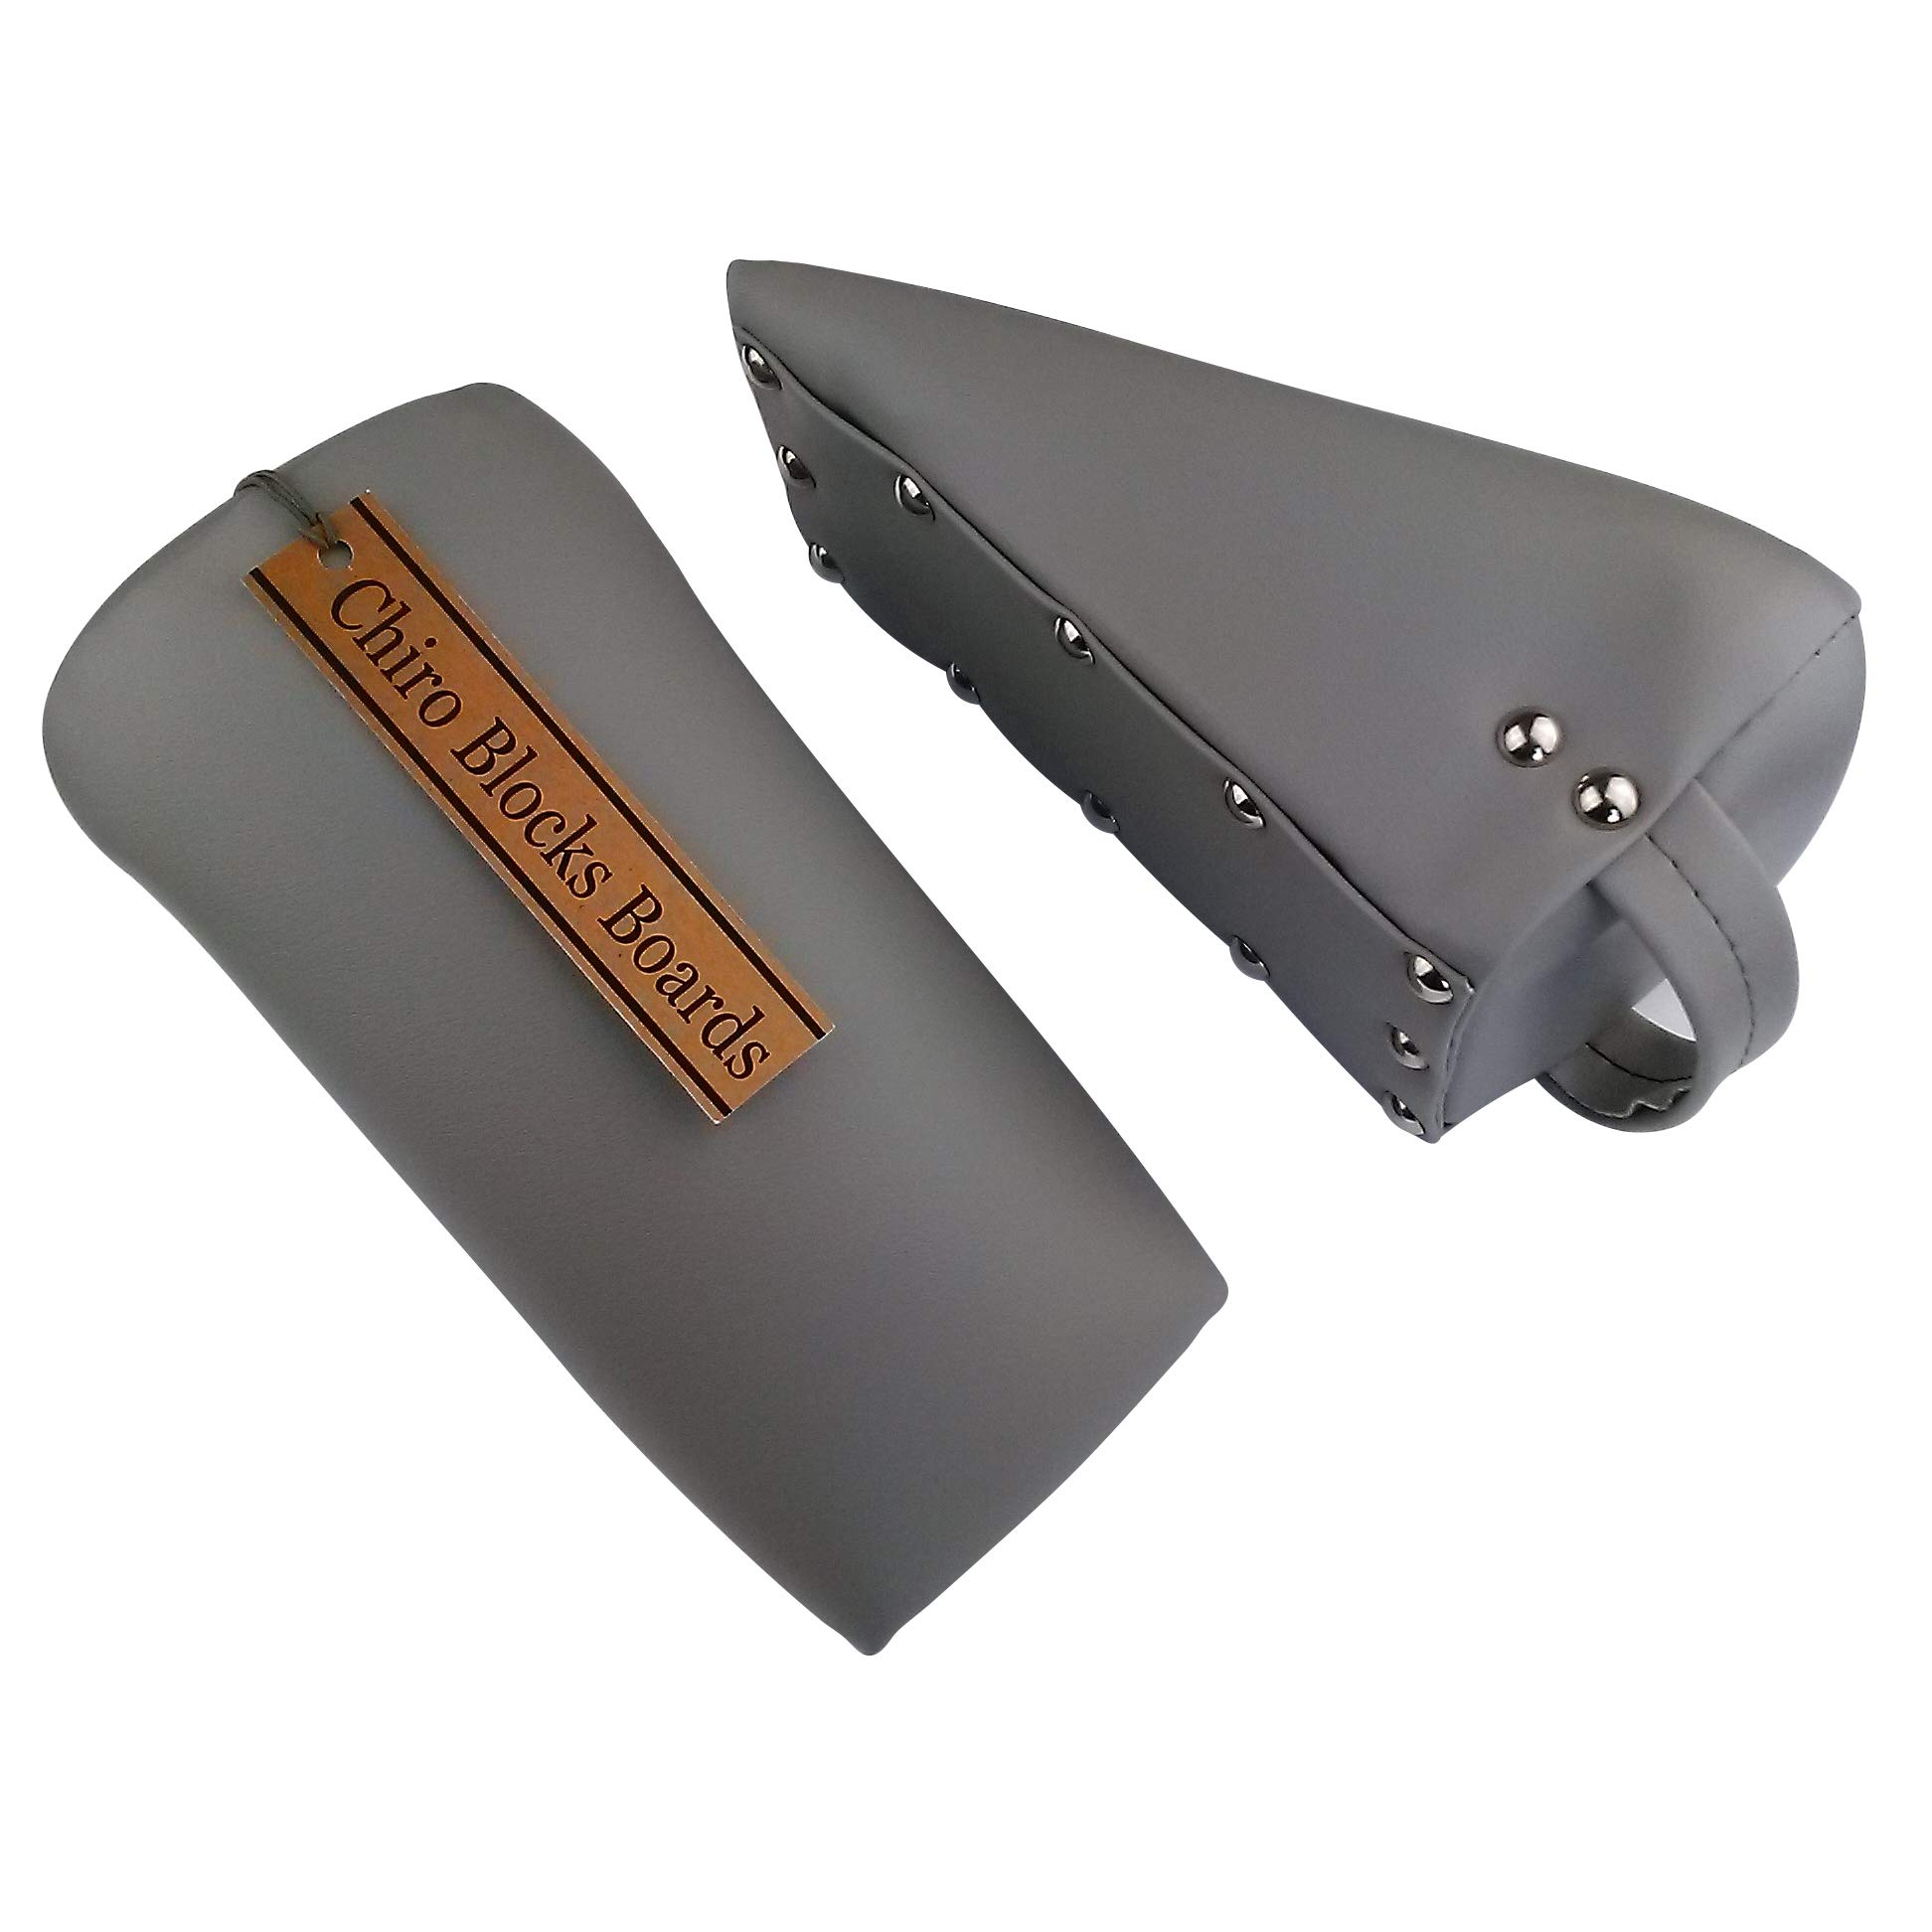 Chiro Blocks Boards - Professional Pelvic Sacral Blocks - 1 Pair Grey by Chiro Blocks Boards